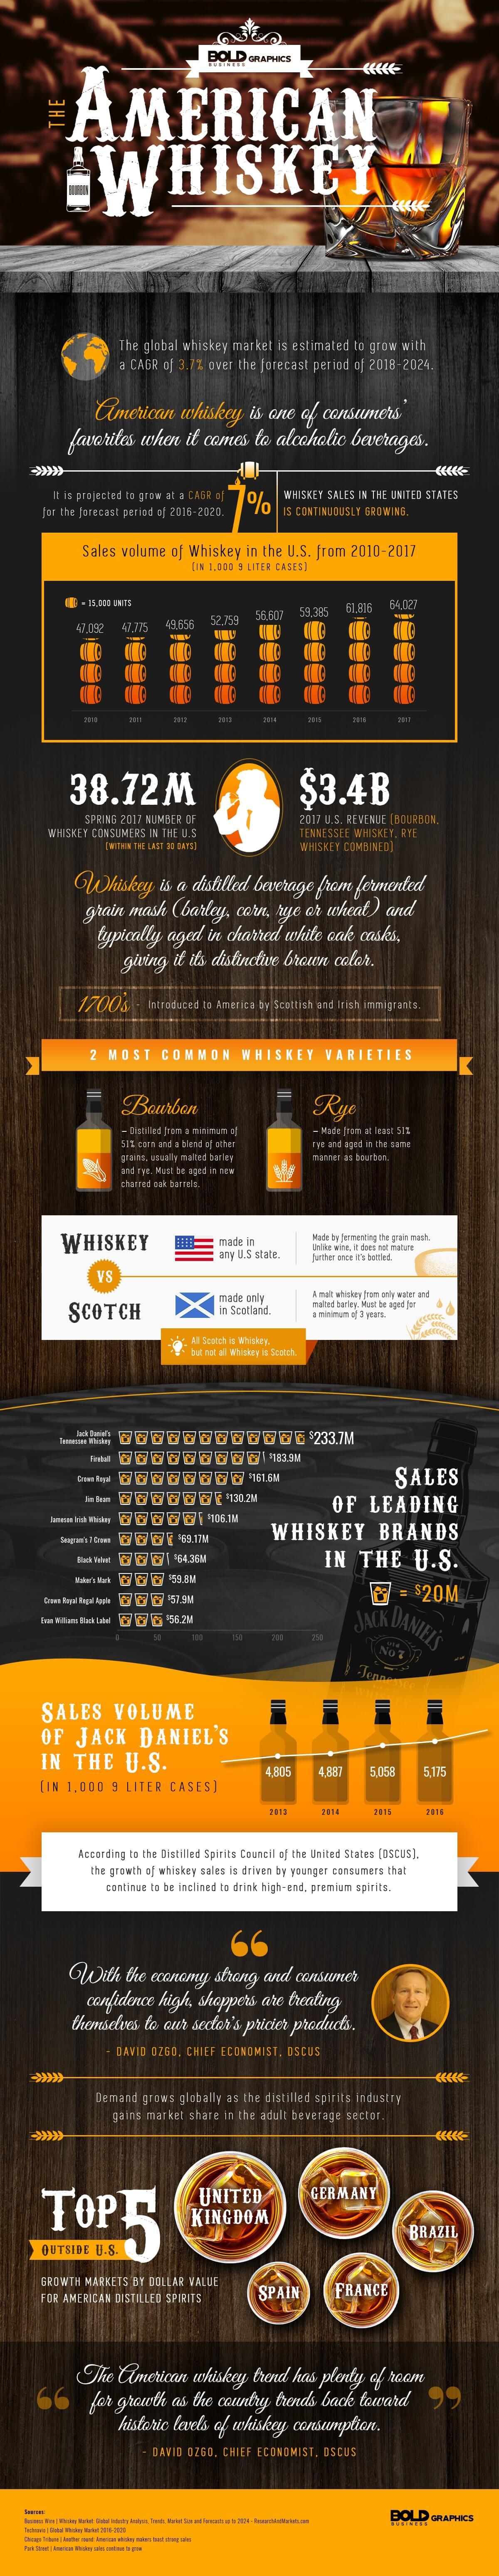 America Whiskey Statistics Infographic